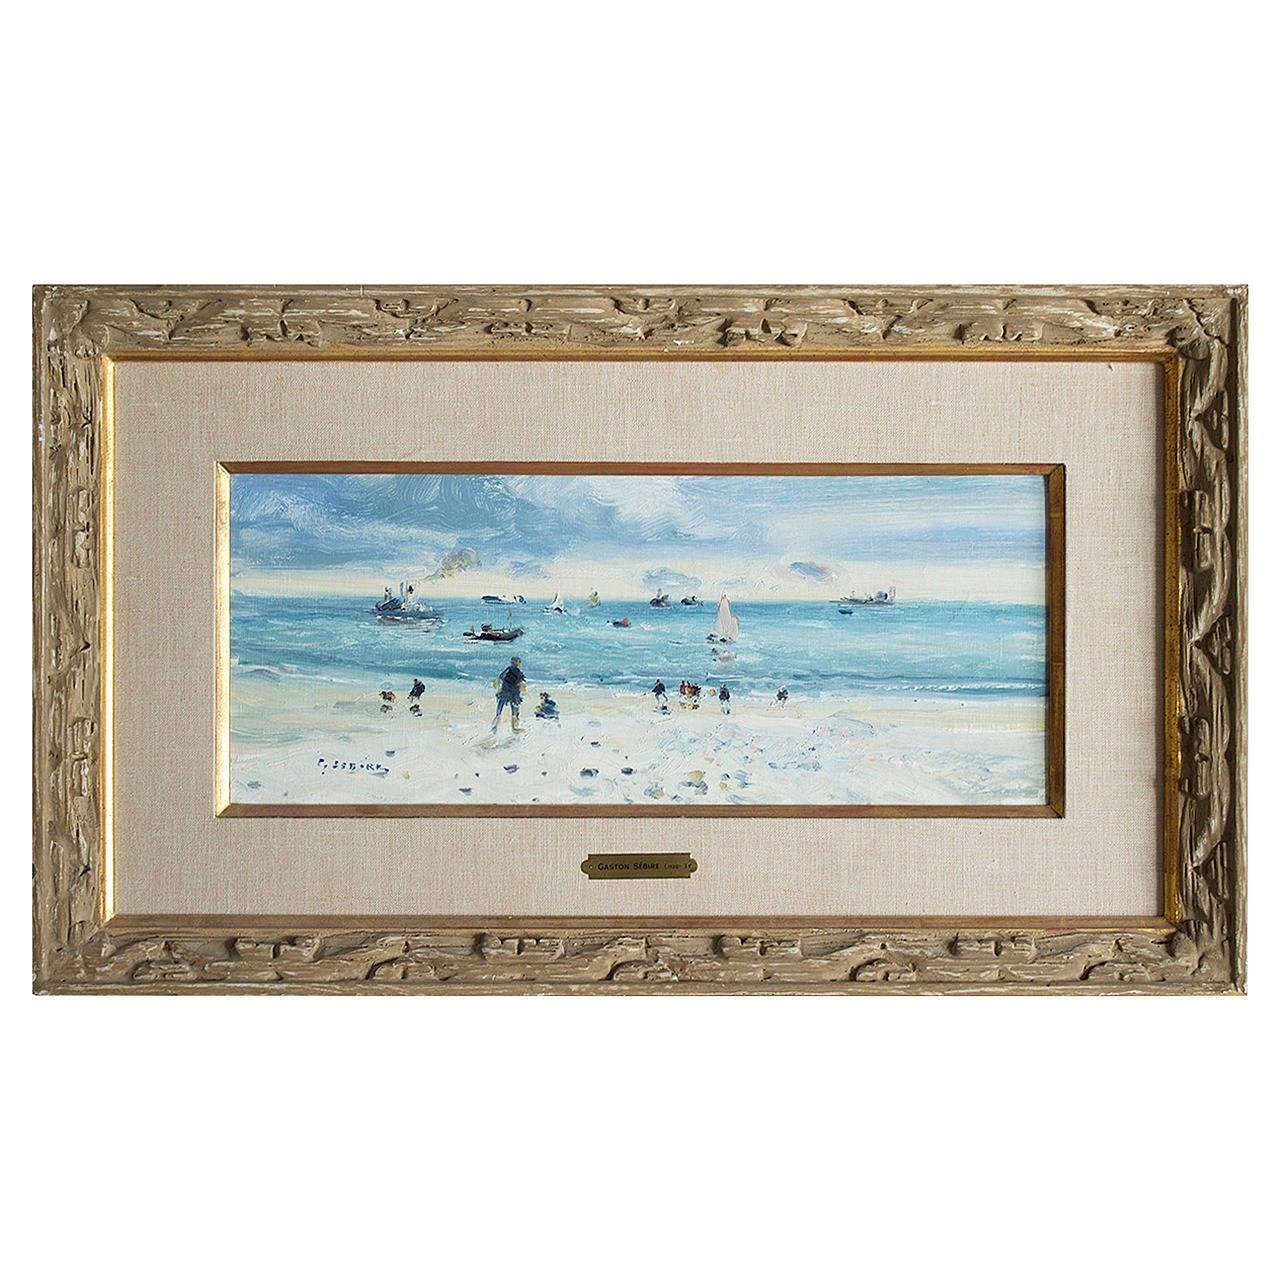 Plage au Havre, Oil on Canvas by Gaston Sebire